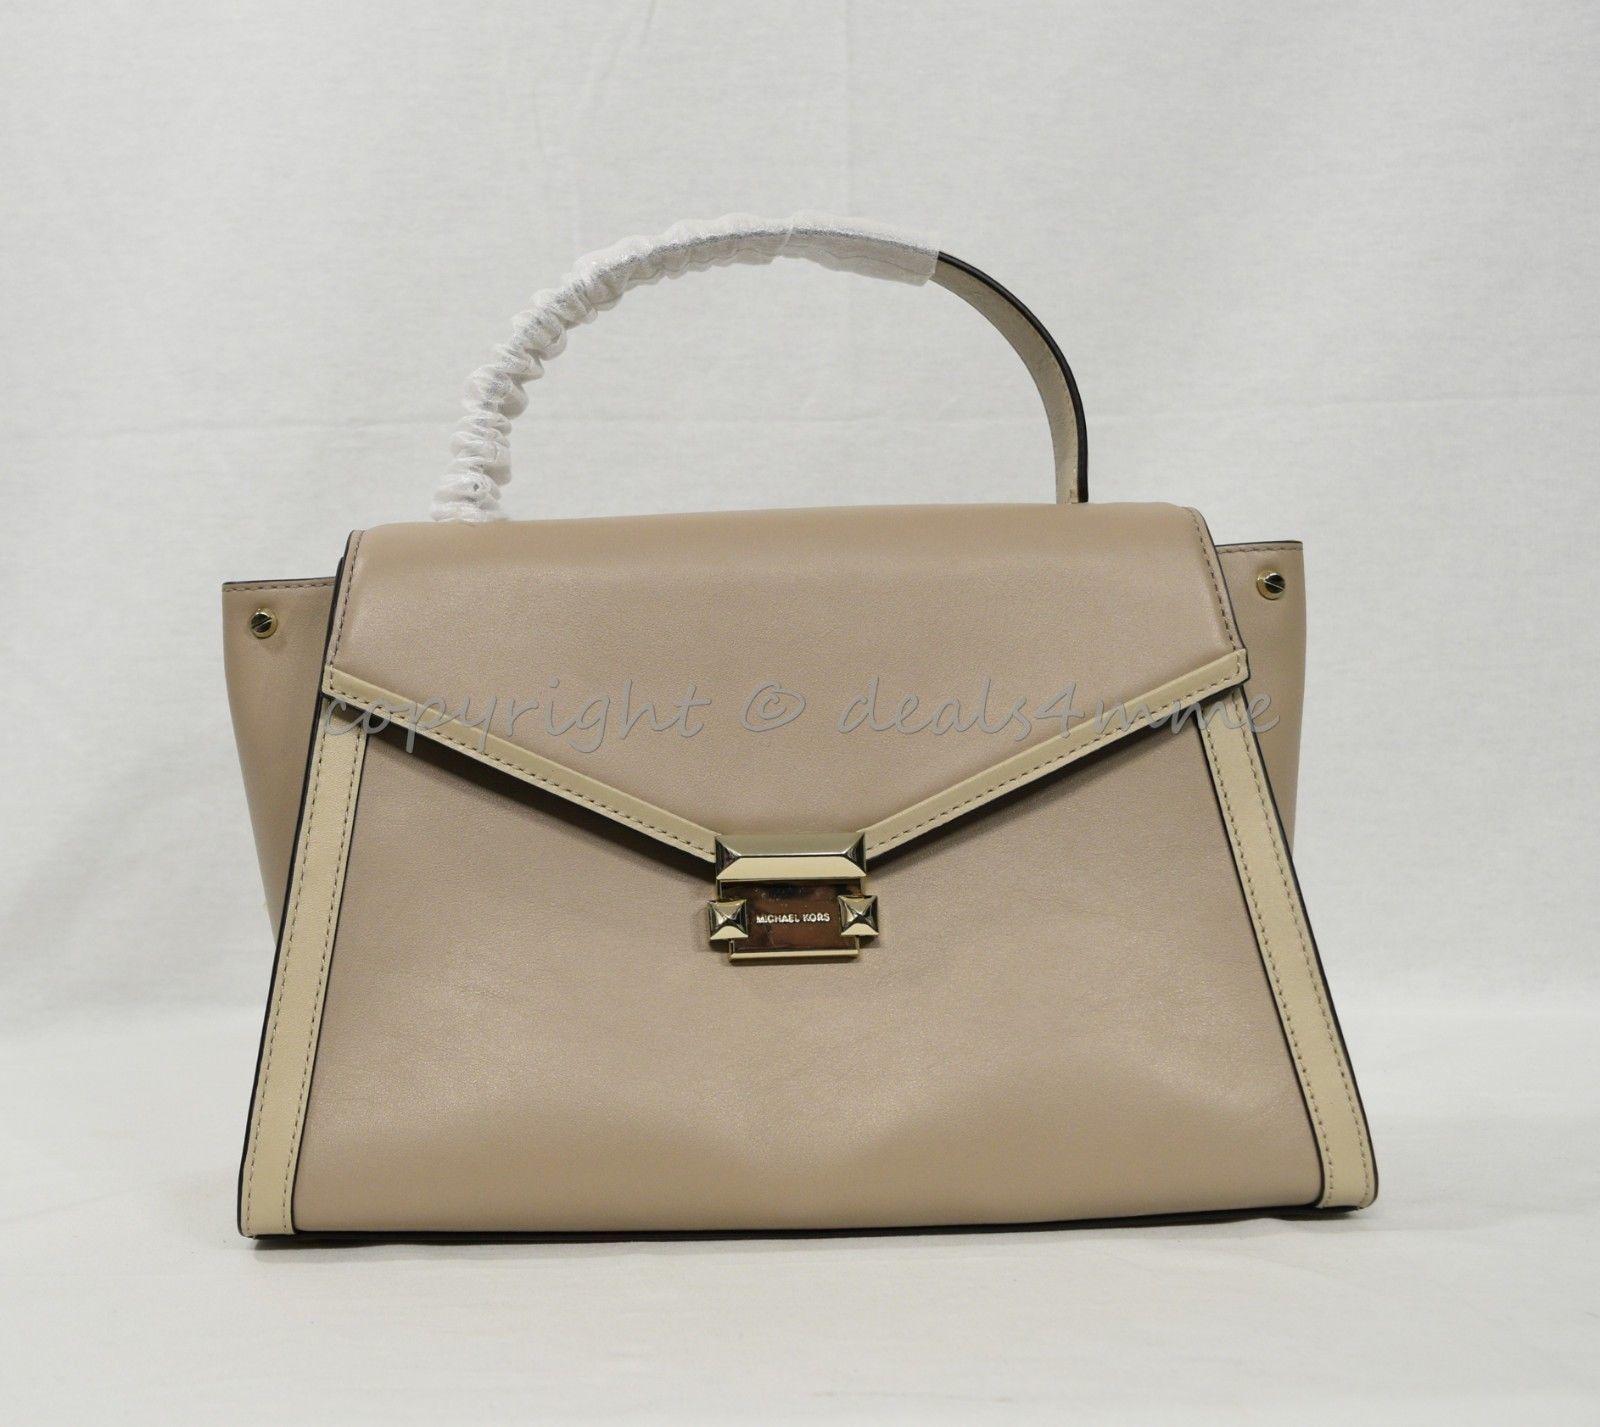 93fcdd392357 Michael Kors Whitney Large Leather Colorblock Satchel Shoulder Bag. Truffle  Oat